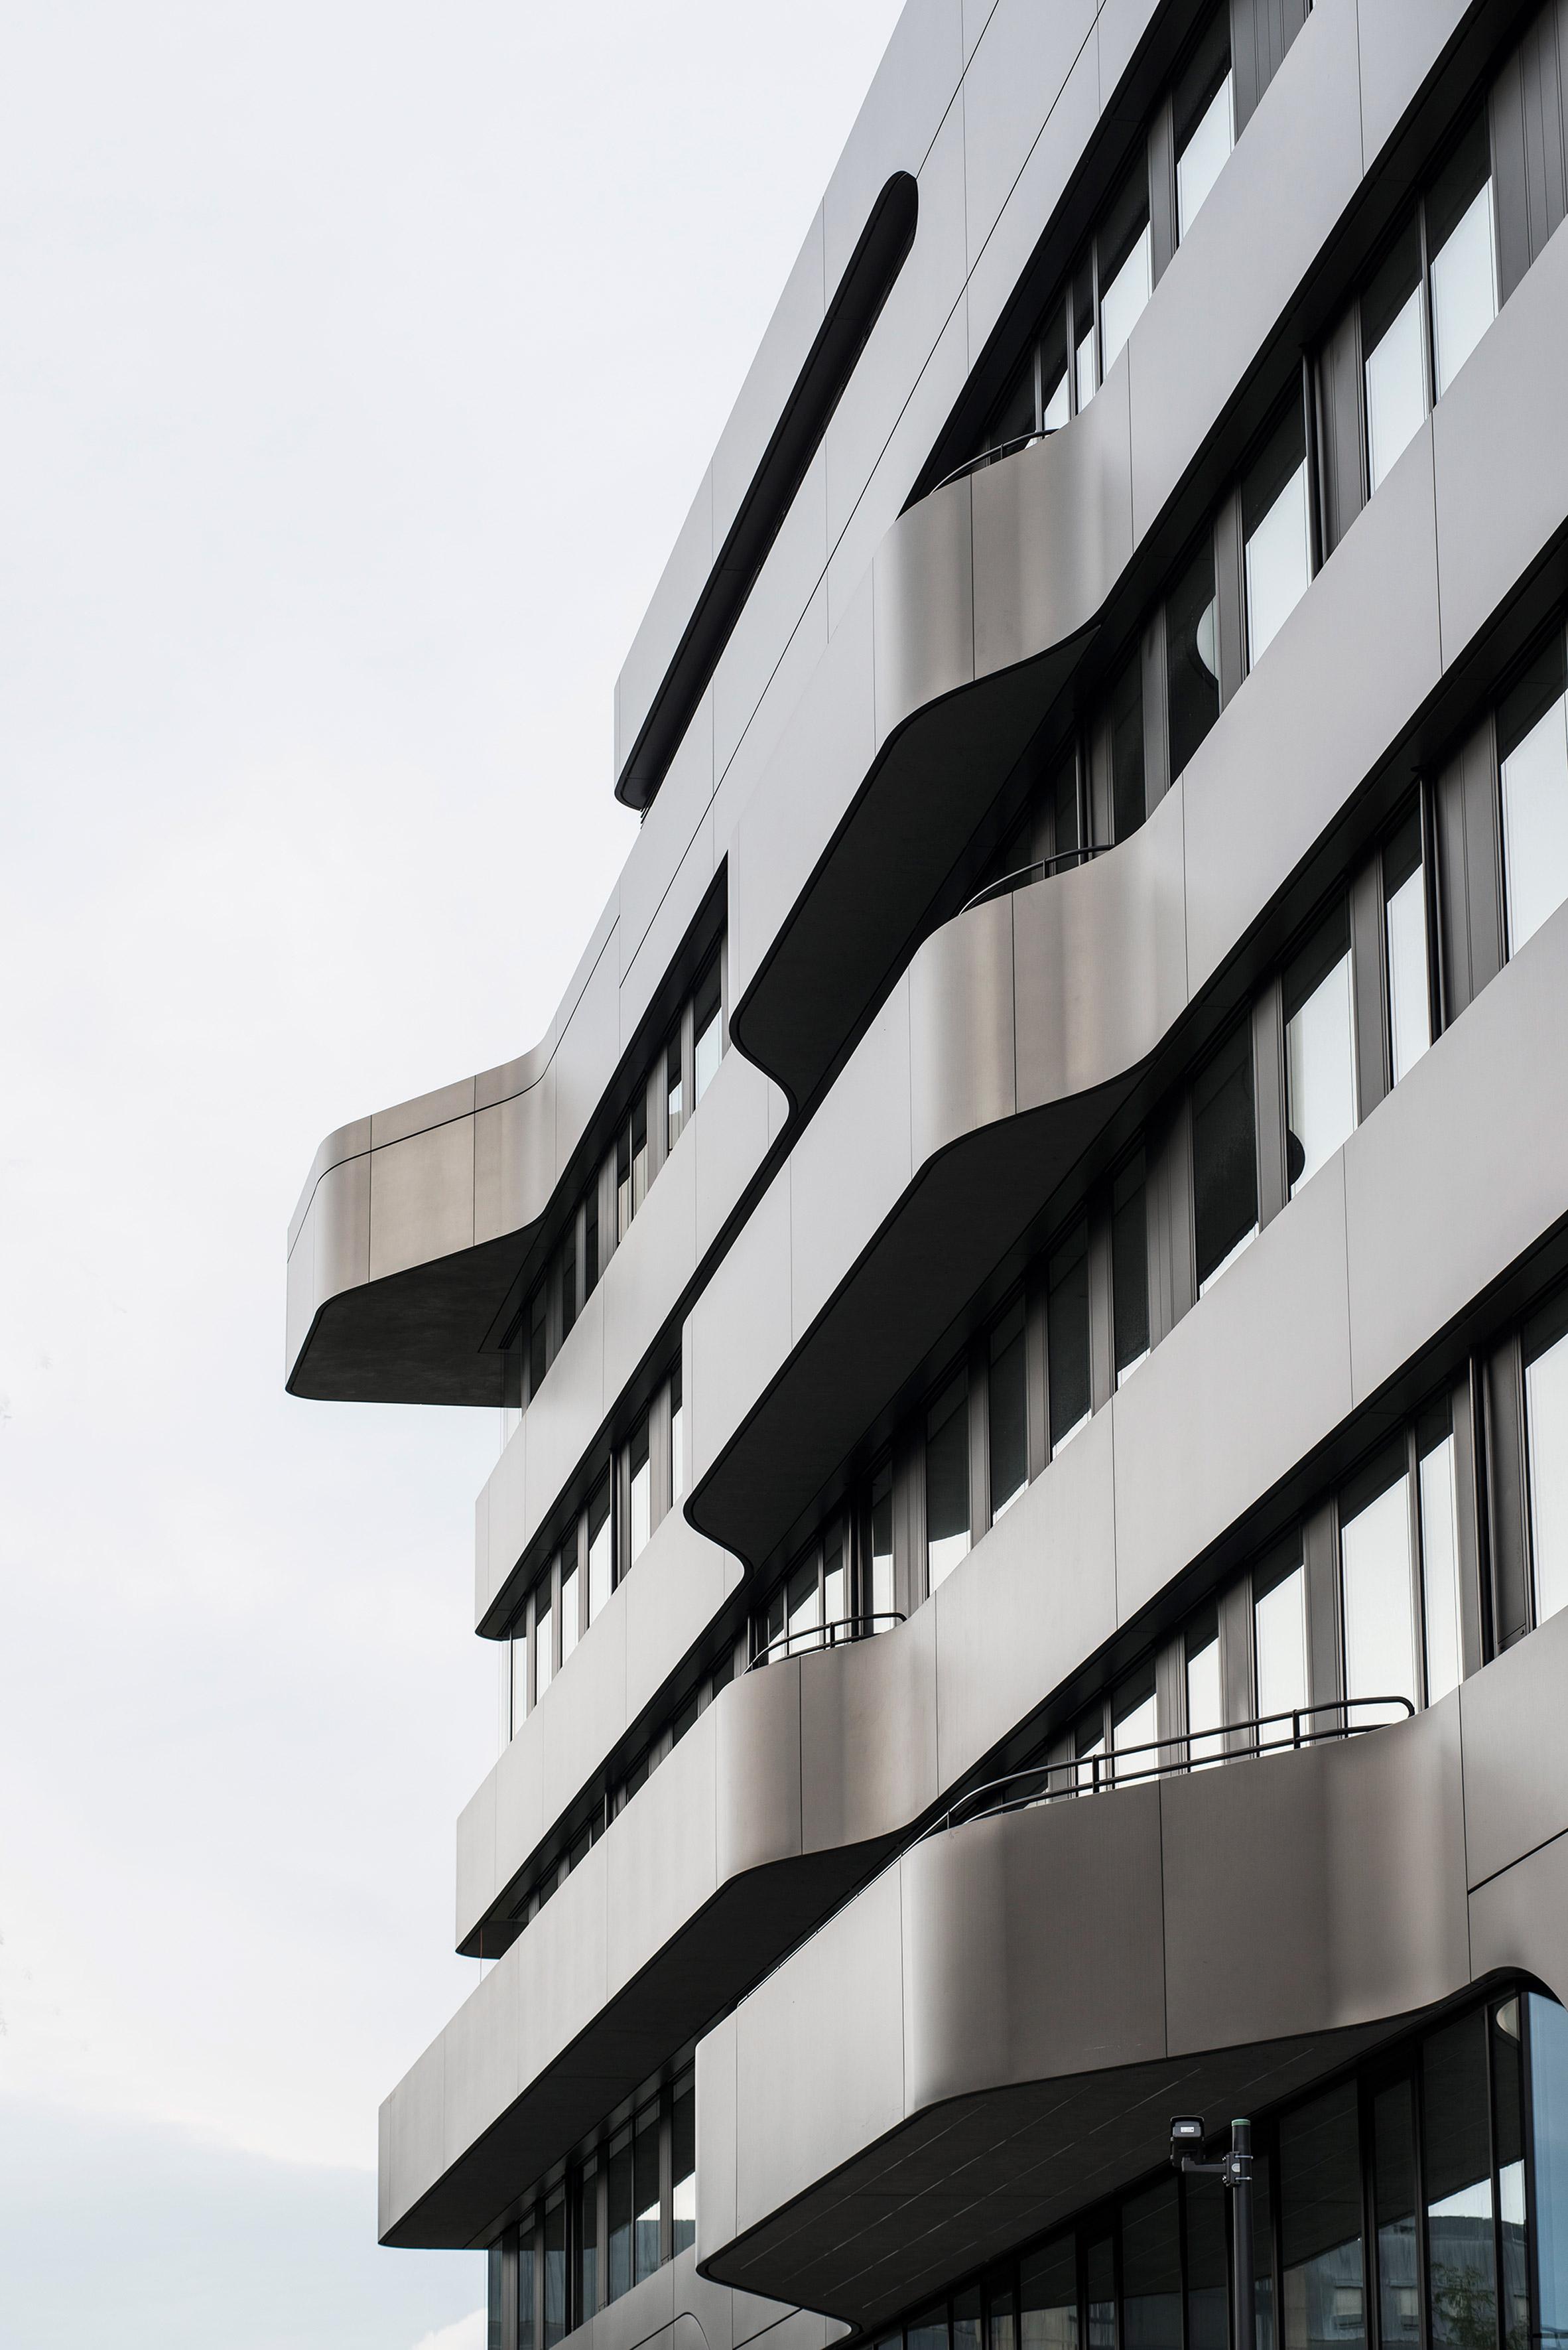 FOM Hochschule building by Jürgen Mayer H